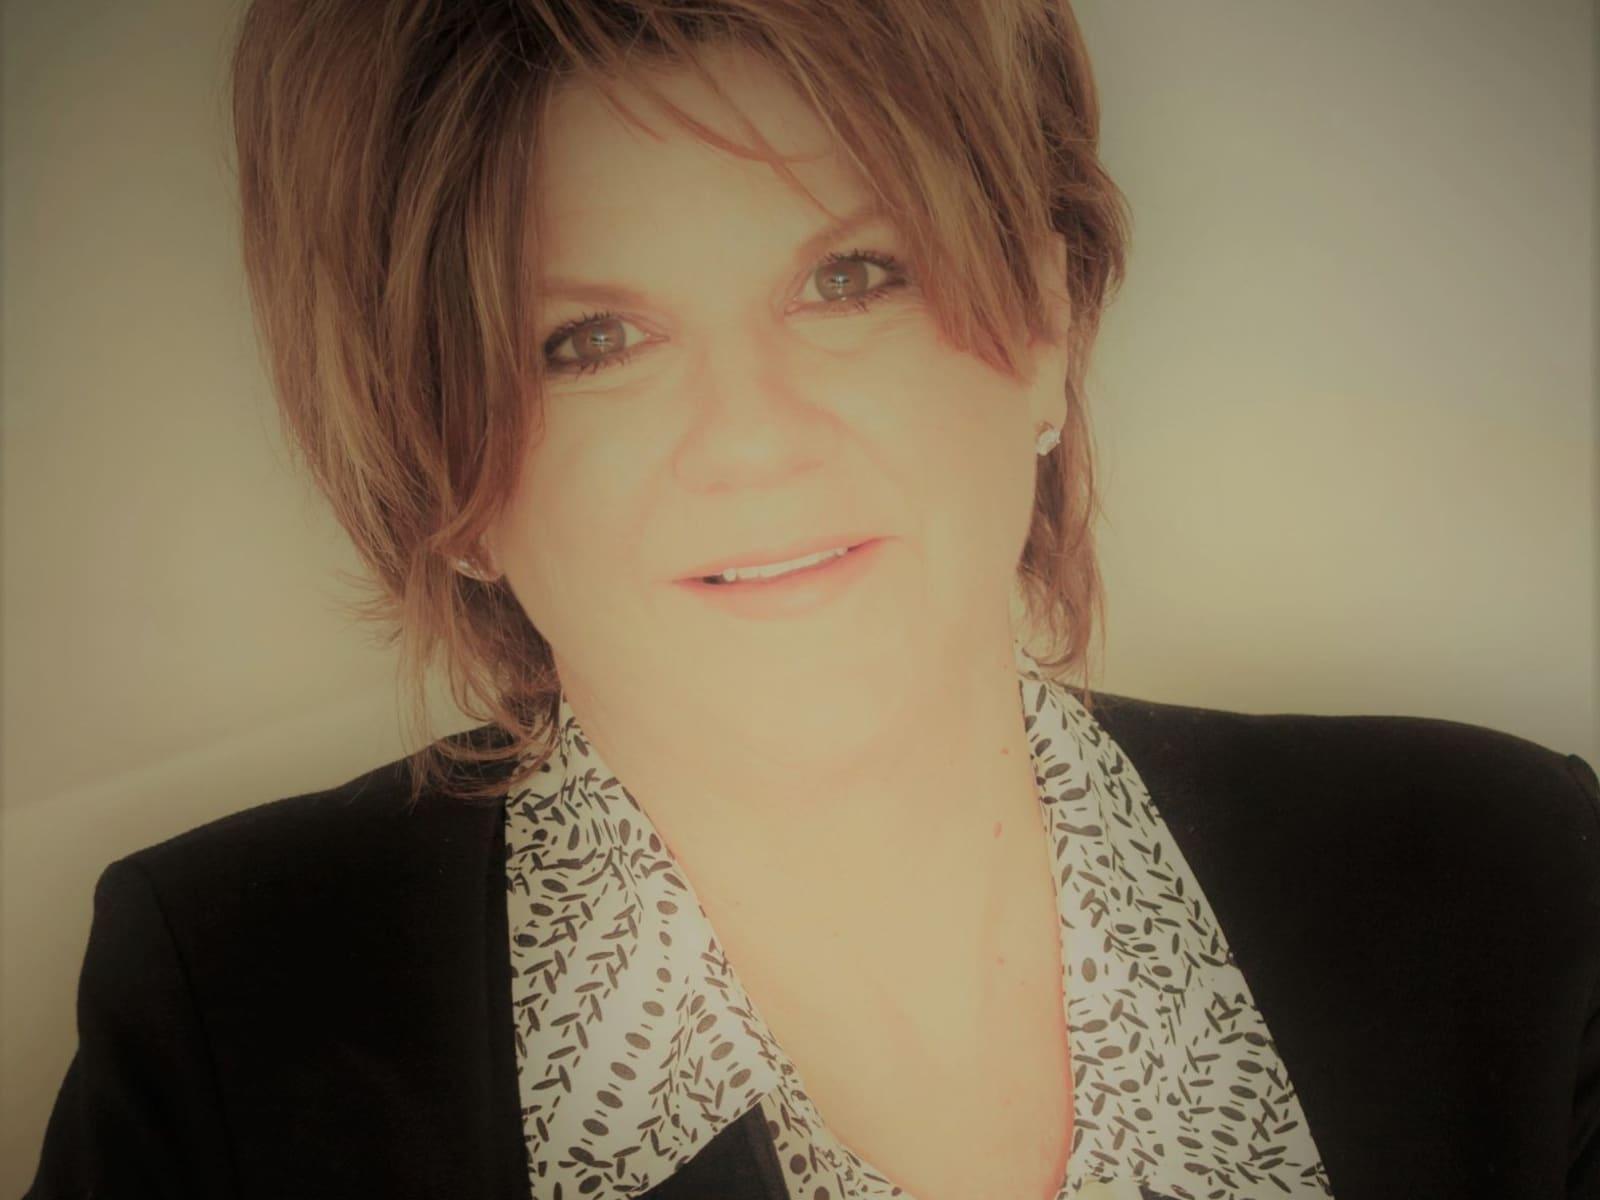 Pam from Grand Rapids, Michigan, United States